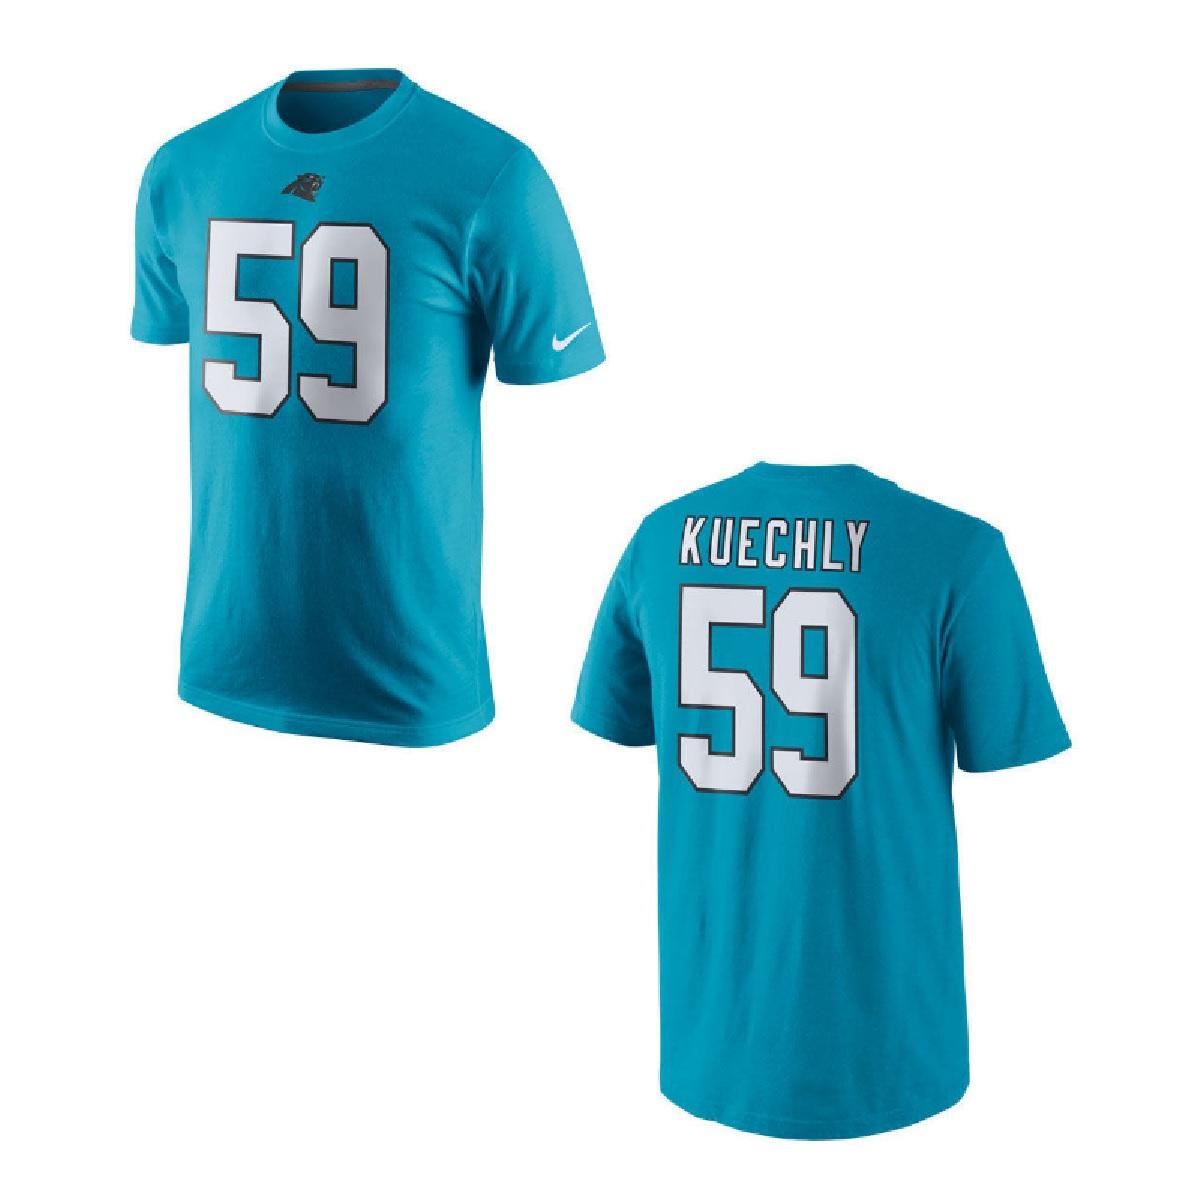 Carolina Panthers Luke Kuechly Blue Youth Nike Player Pride Tee2 T-Shirt (Youth XL)